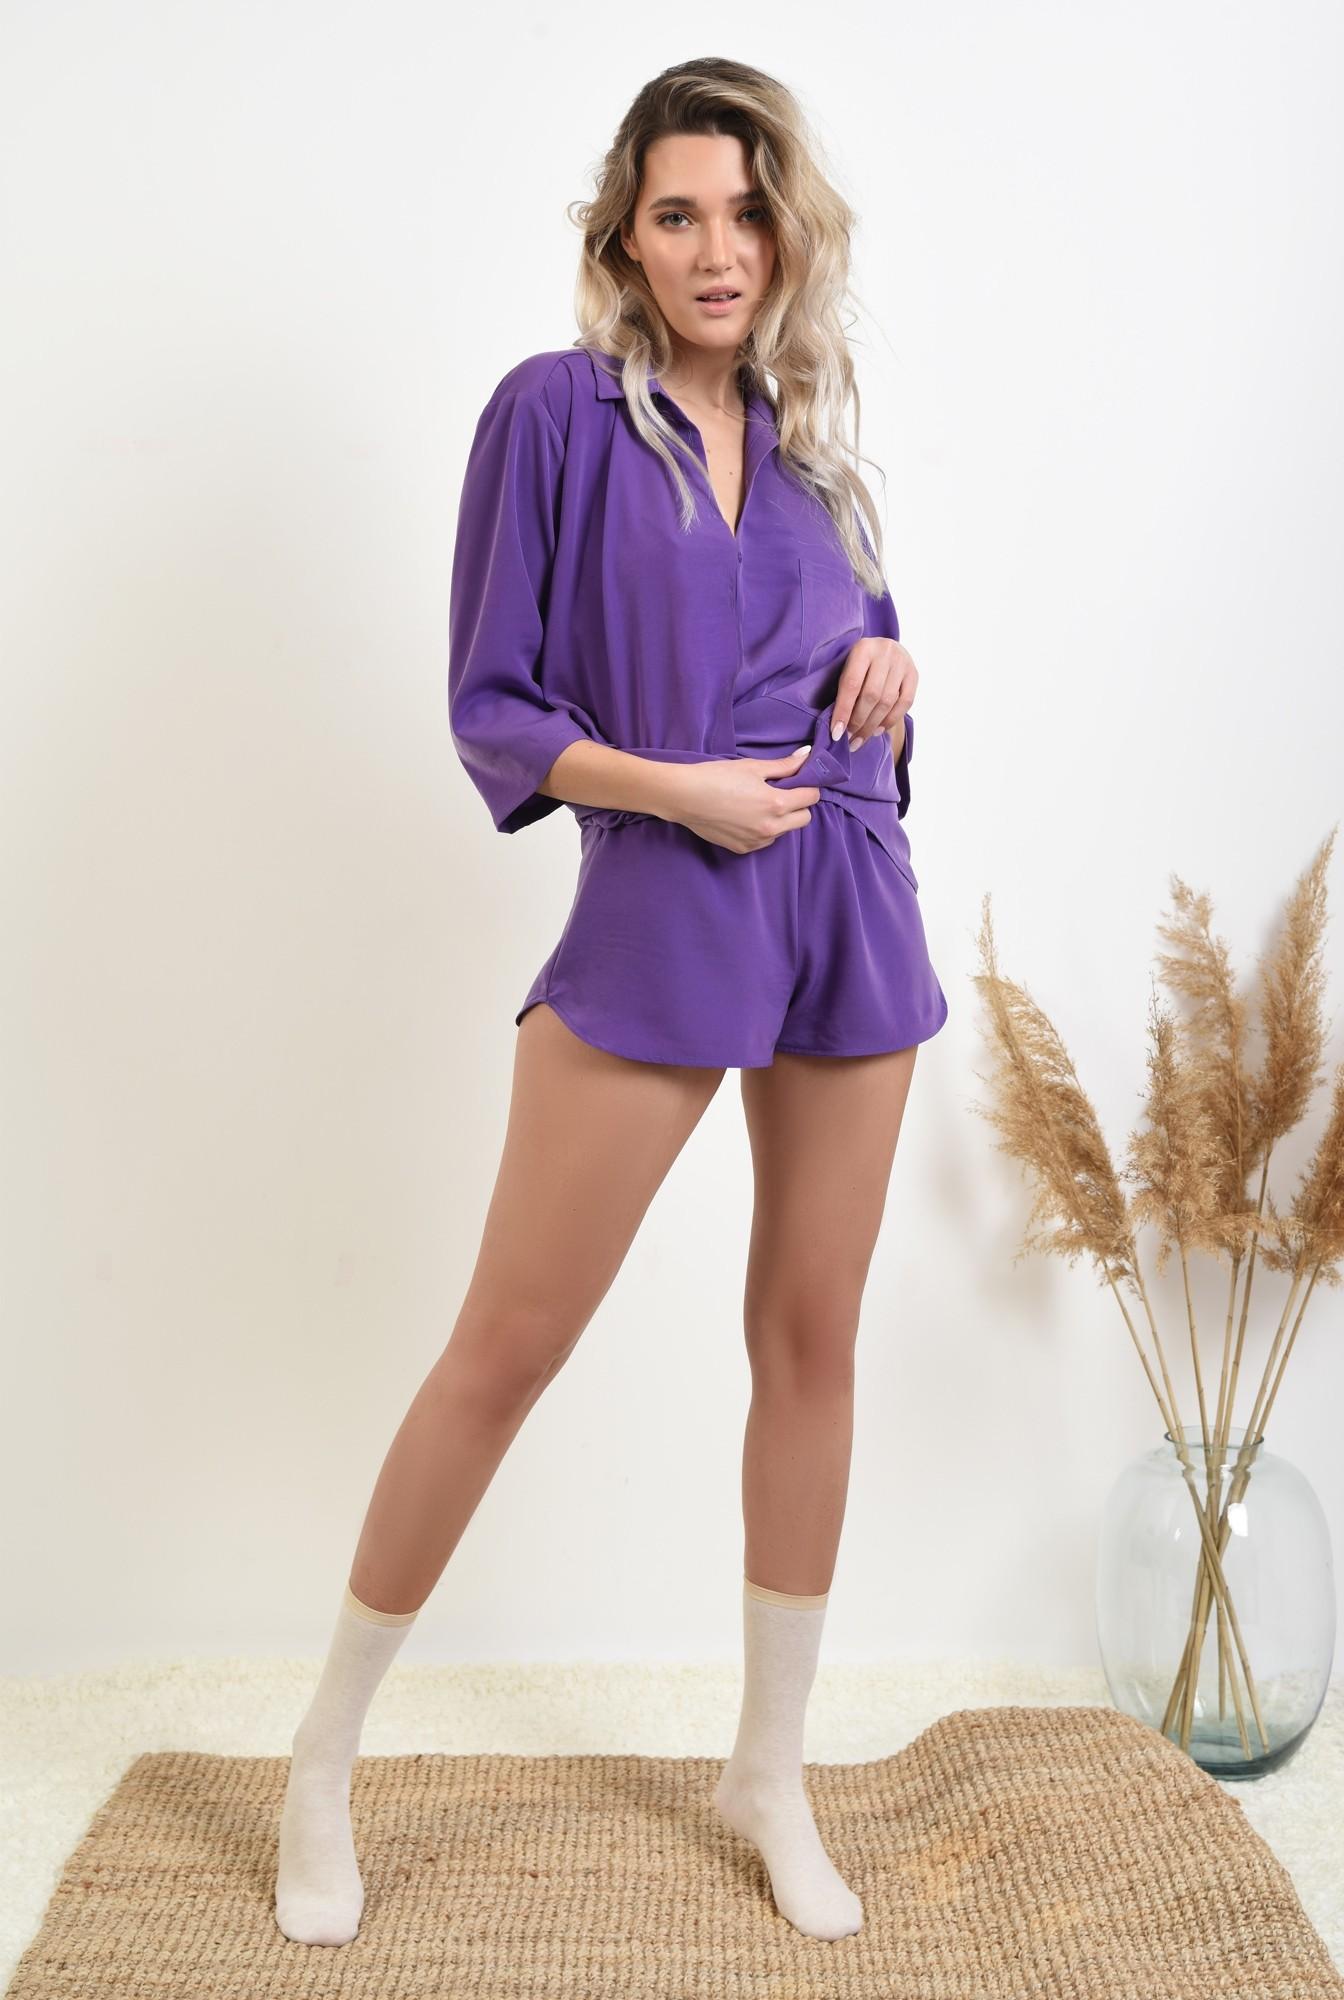 0 - pantaloni scurti, casual, betelie in contrast, sort lejer